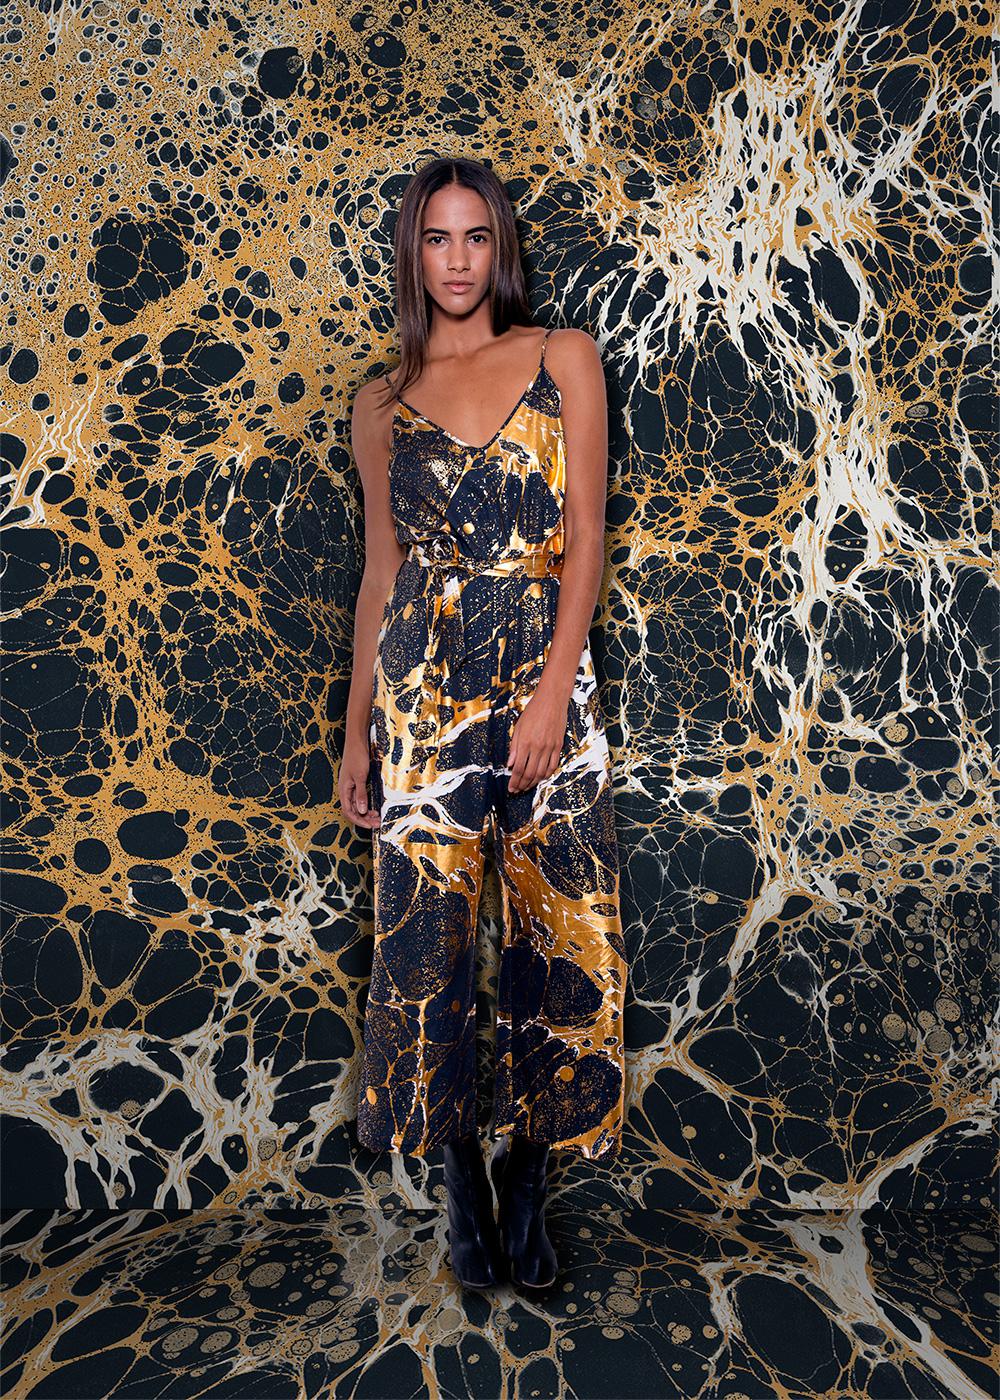 Calico Wallpaper Debuts New Fashion Line